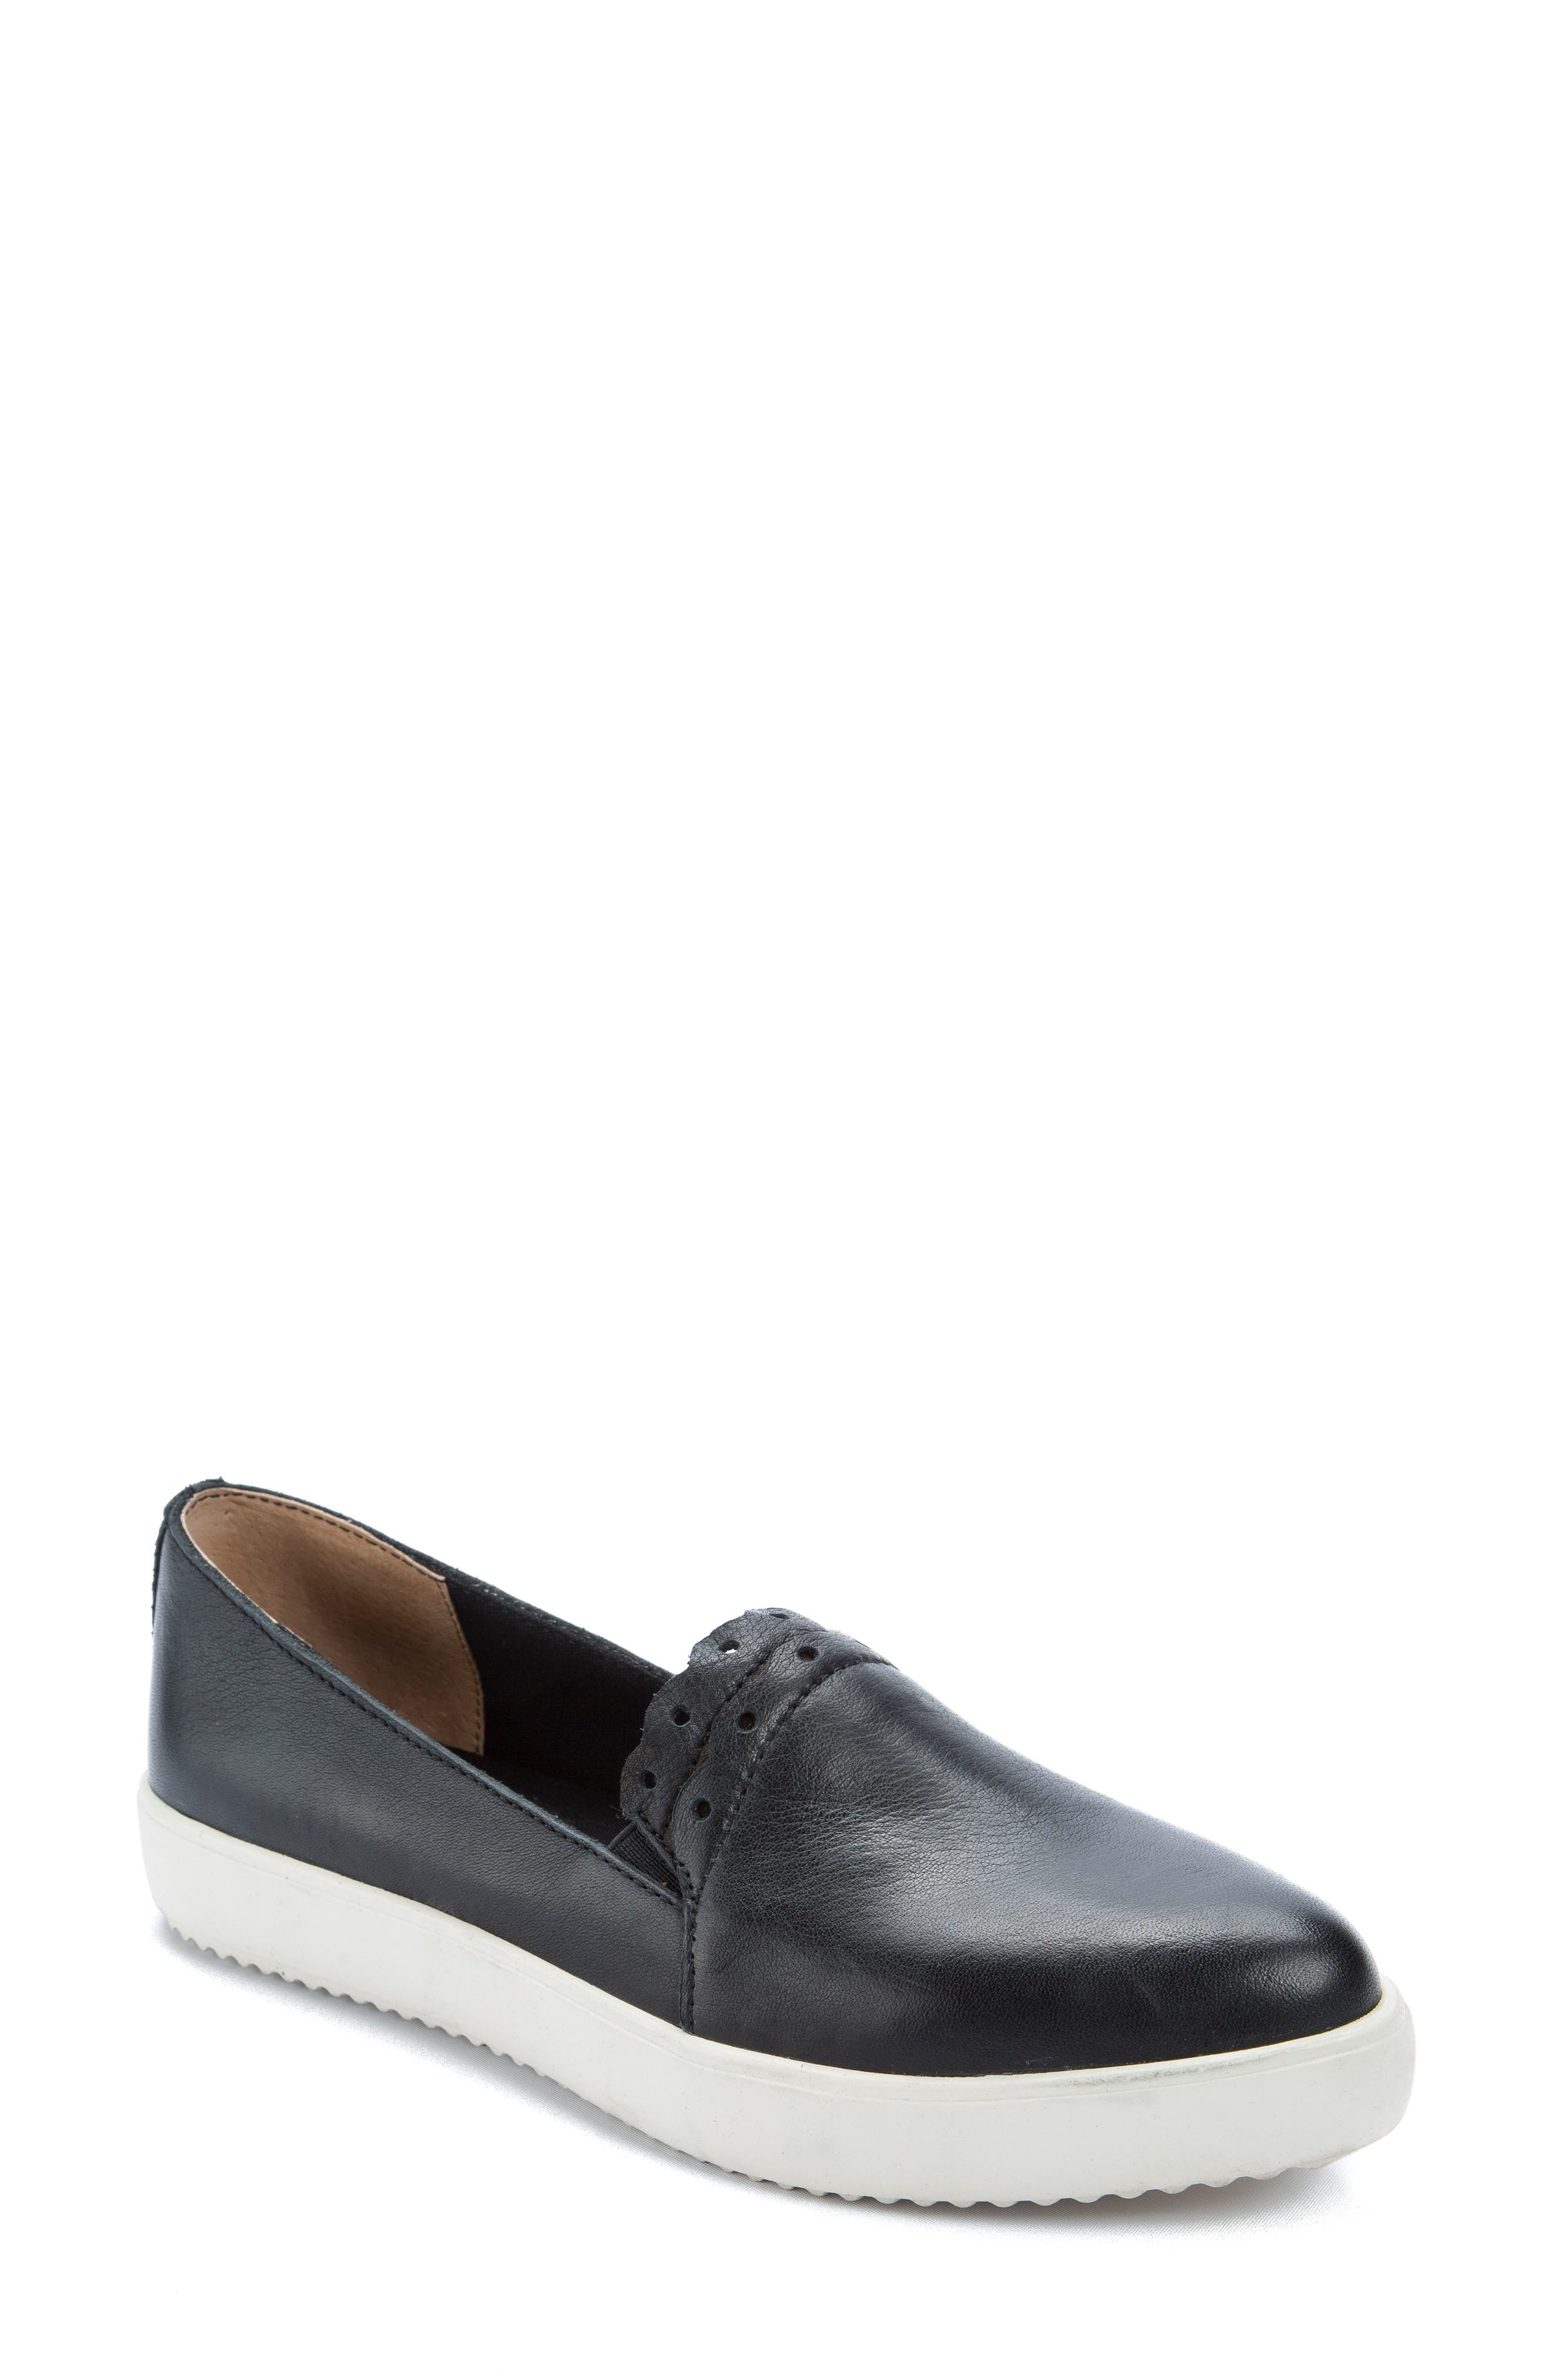 Roe Slip-On Sneaker,                             Main thumbnail 1, color,                             001